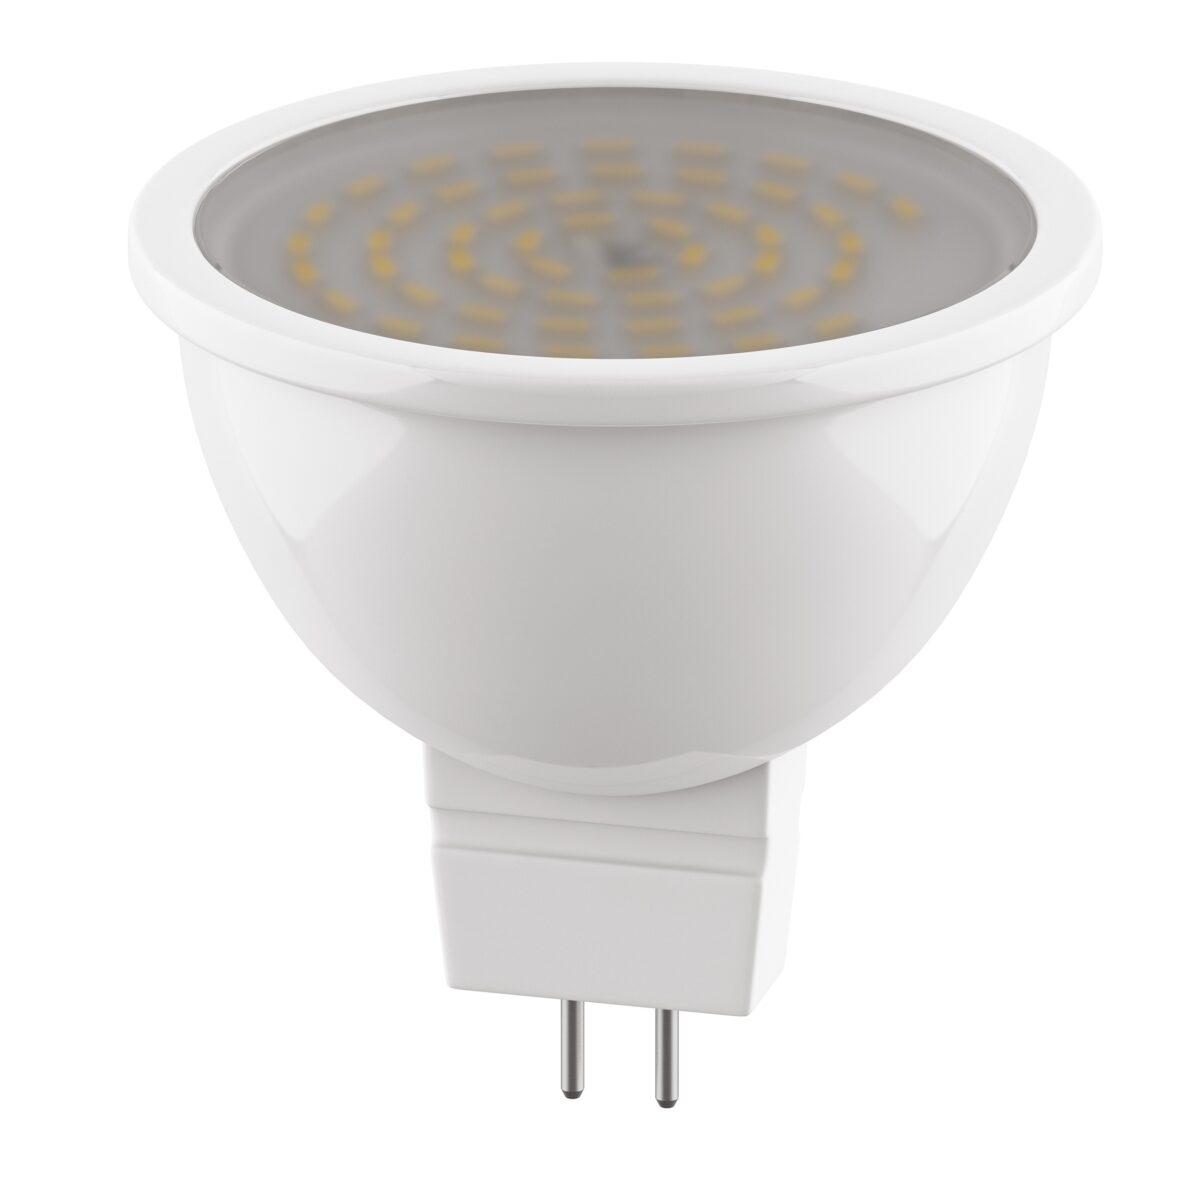 940214 ЛАМПА LED 220V MR16 G5.3 6.5W=60W 325LM 120G  FR 4000K 20000H (в комплекте)